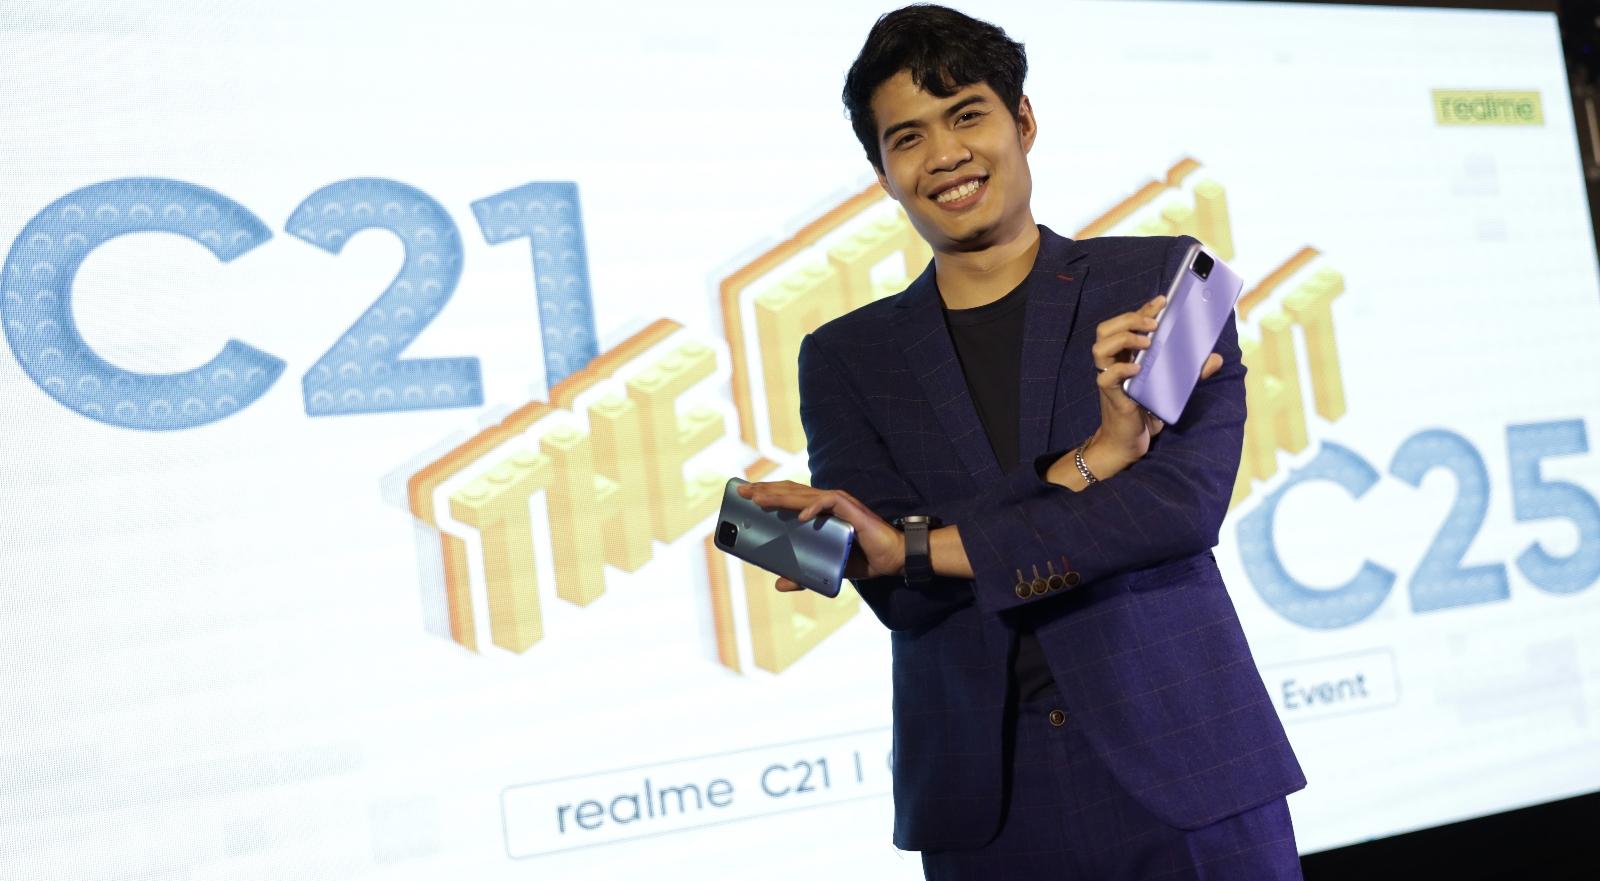 realme เปิดตัว realme C21 และ realme C25 ตัวจริงเรื่องคุณภาพ พร้อมการันตีมาตรฐานการรับรองระดับโลกจาก TÜV Rheinland Smartphone High Reliability